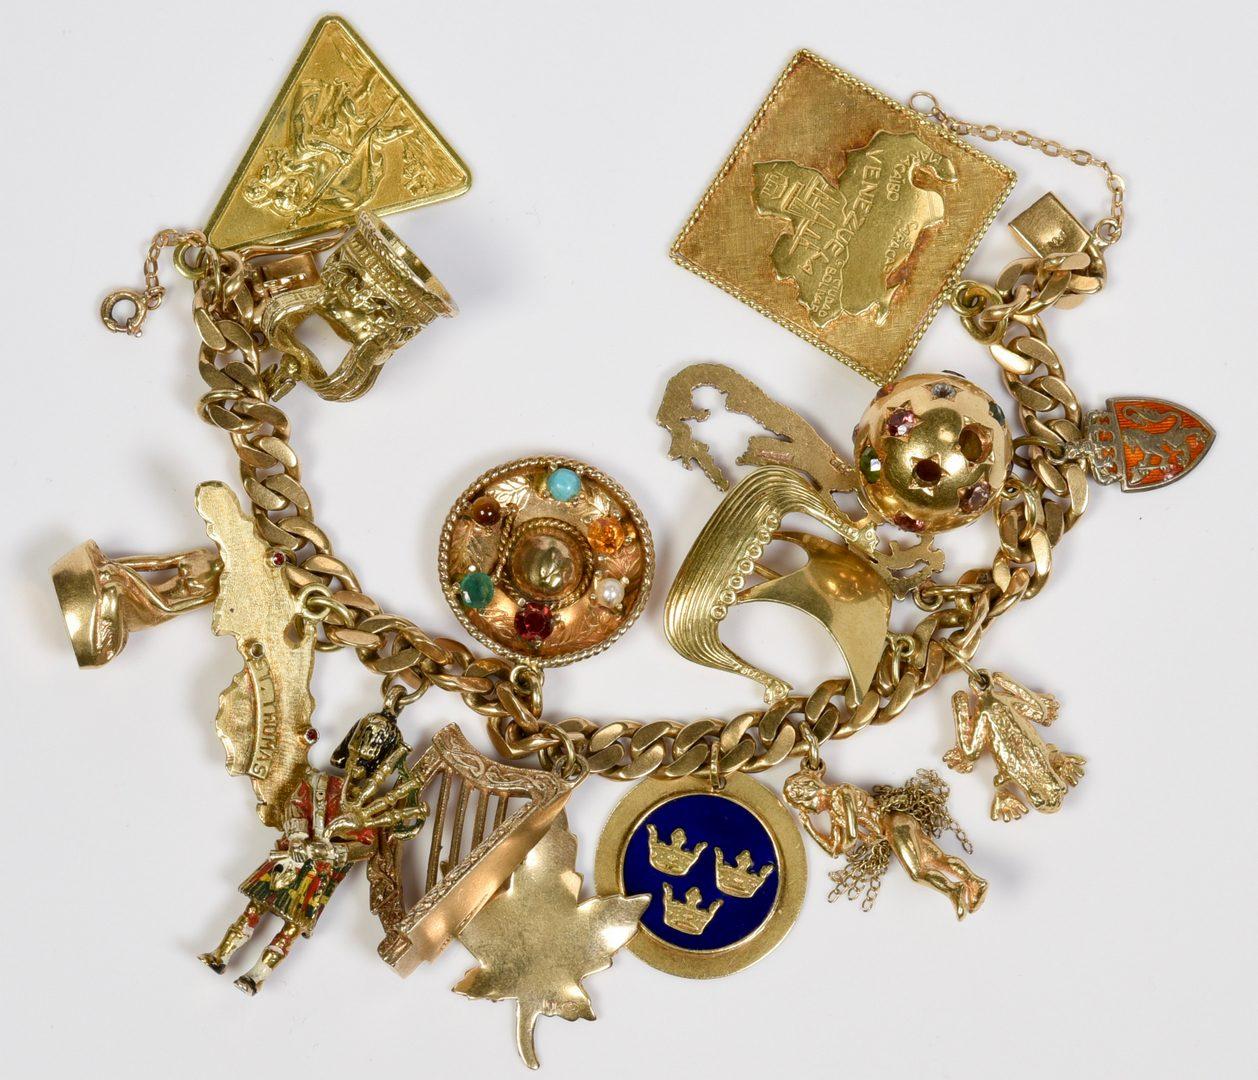 Lot 408: 14K Charm Bracelet, 88.2 grams, 16 charms